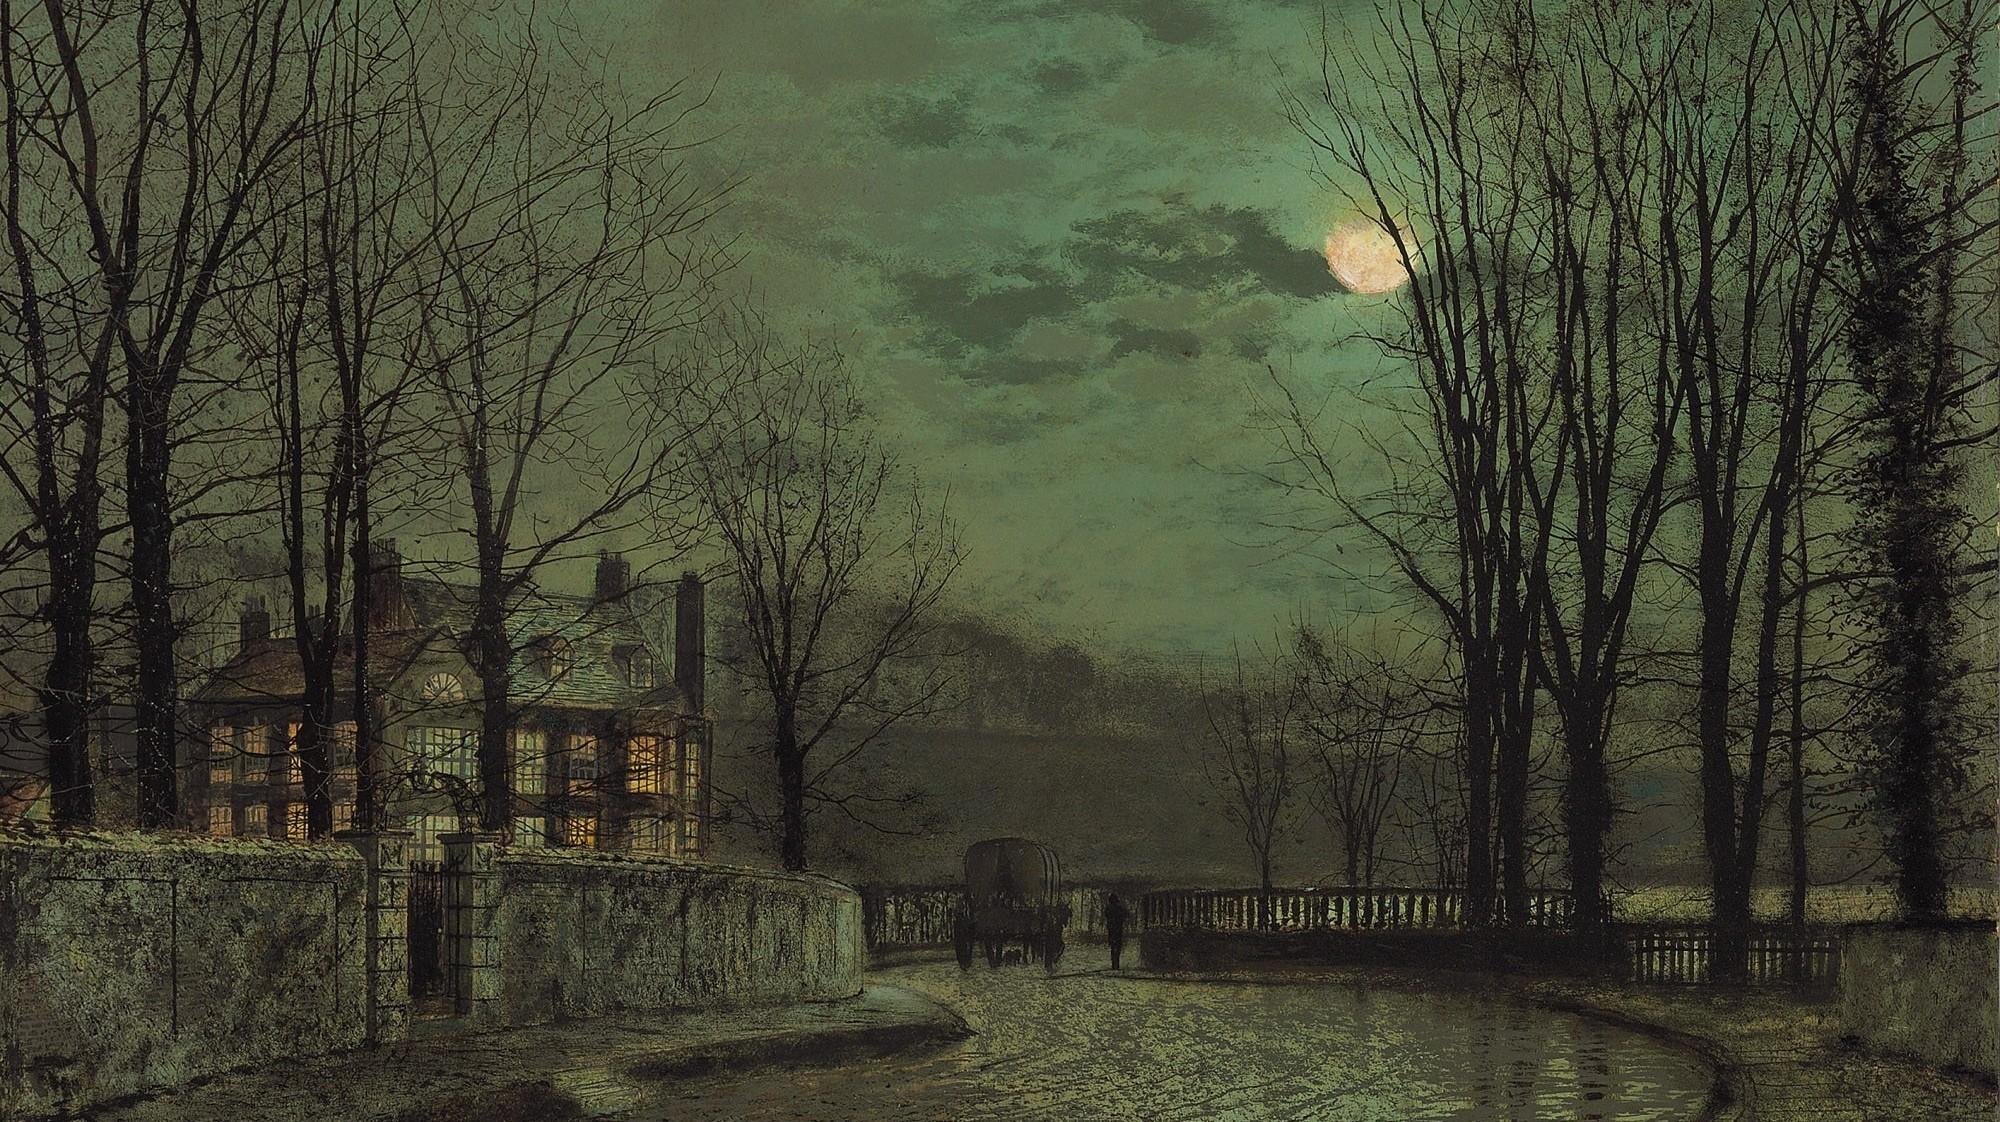 General 2000x1122 John Atkinson Grimshaw classic art Moon night painting artwork